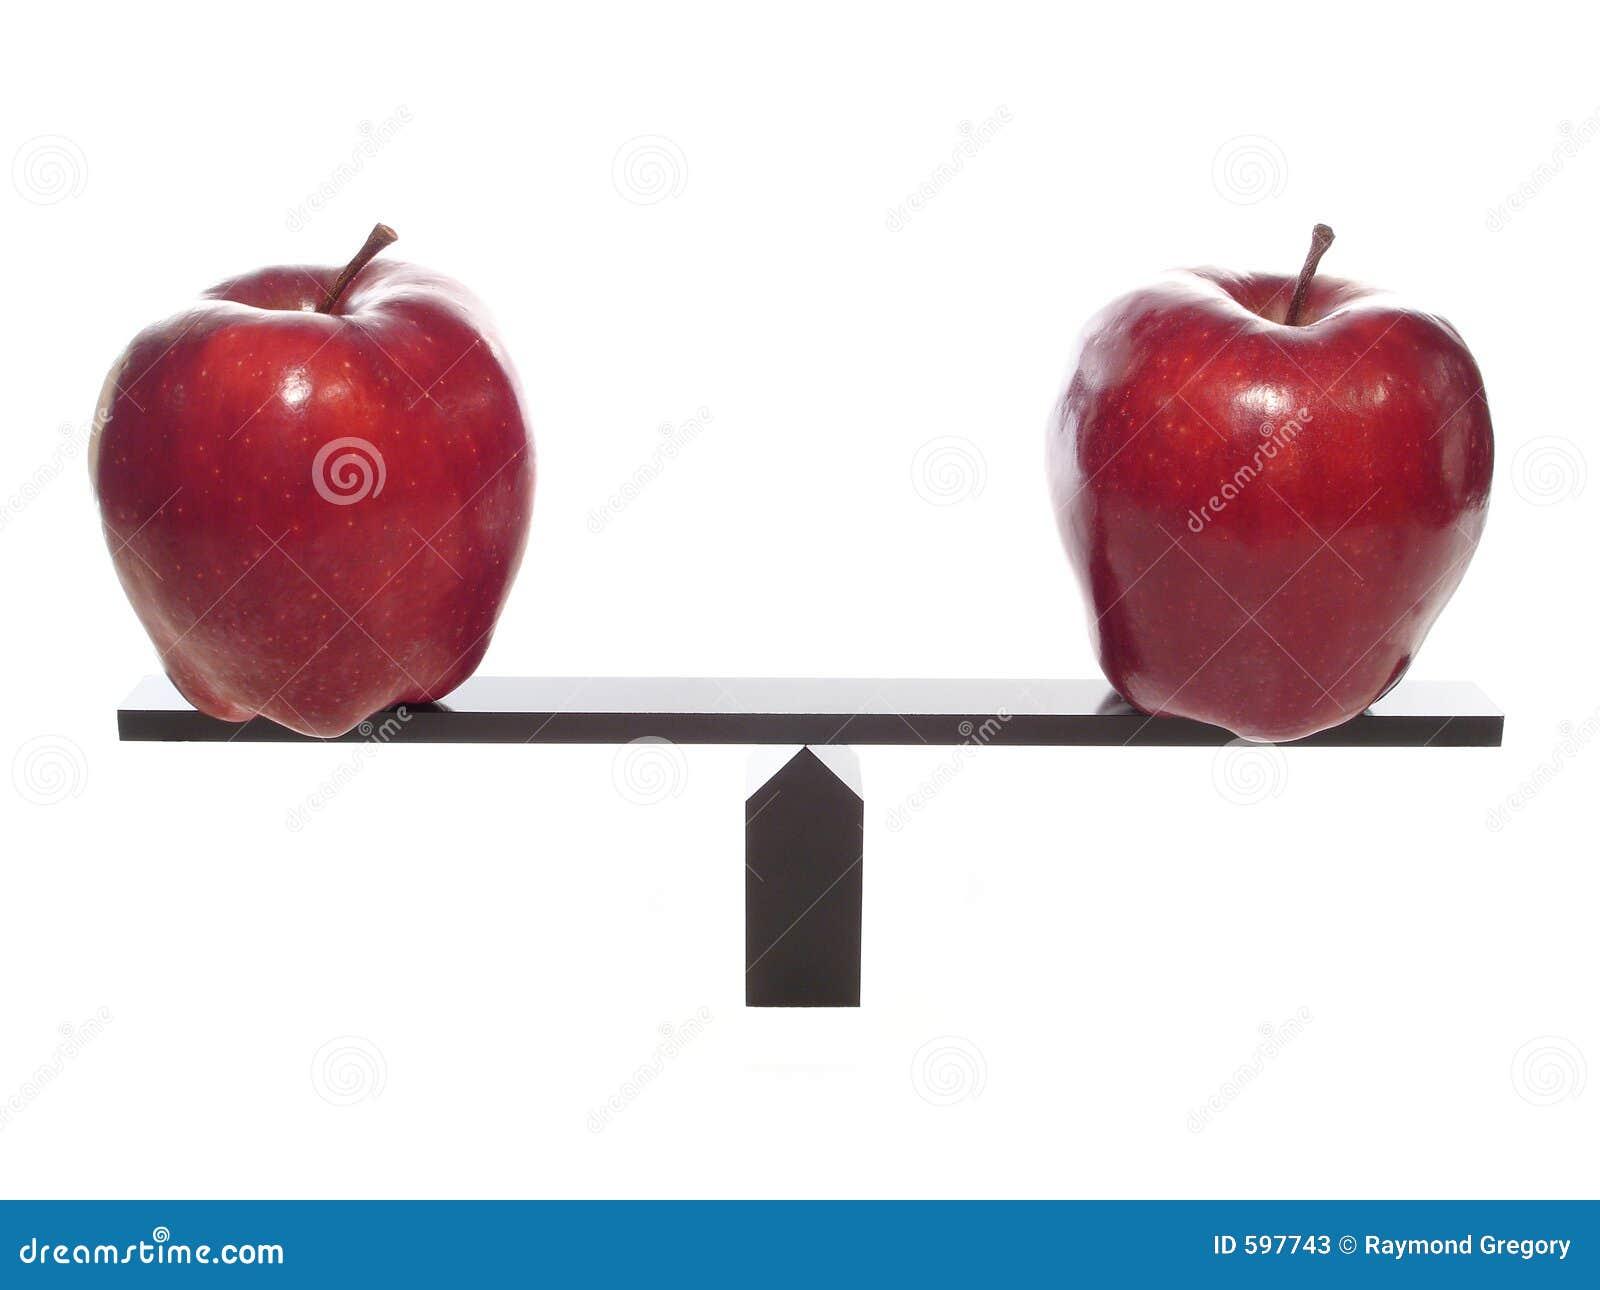 Apples comparing metaphore to